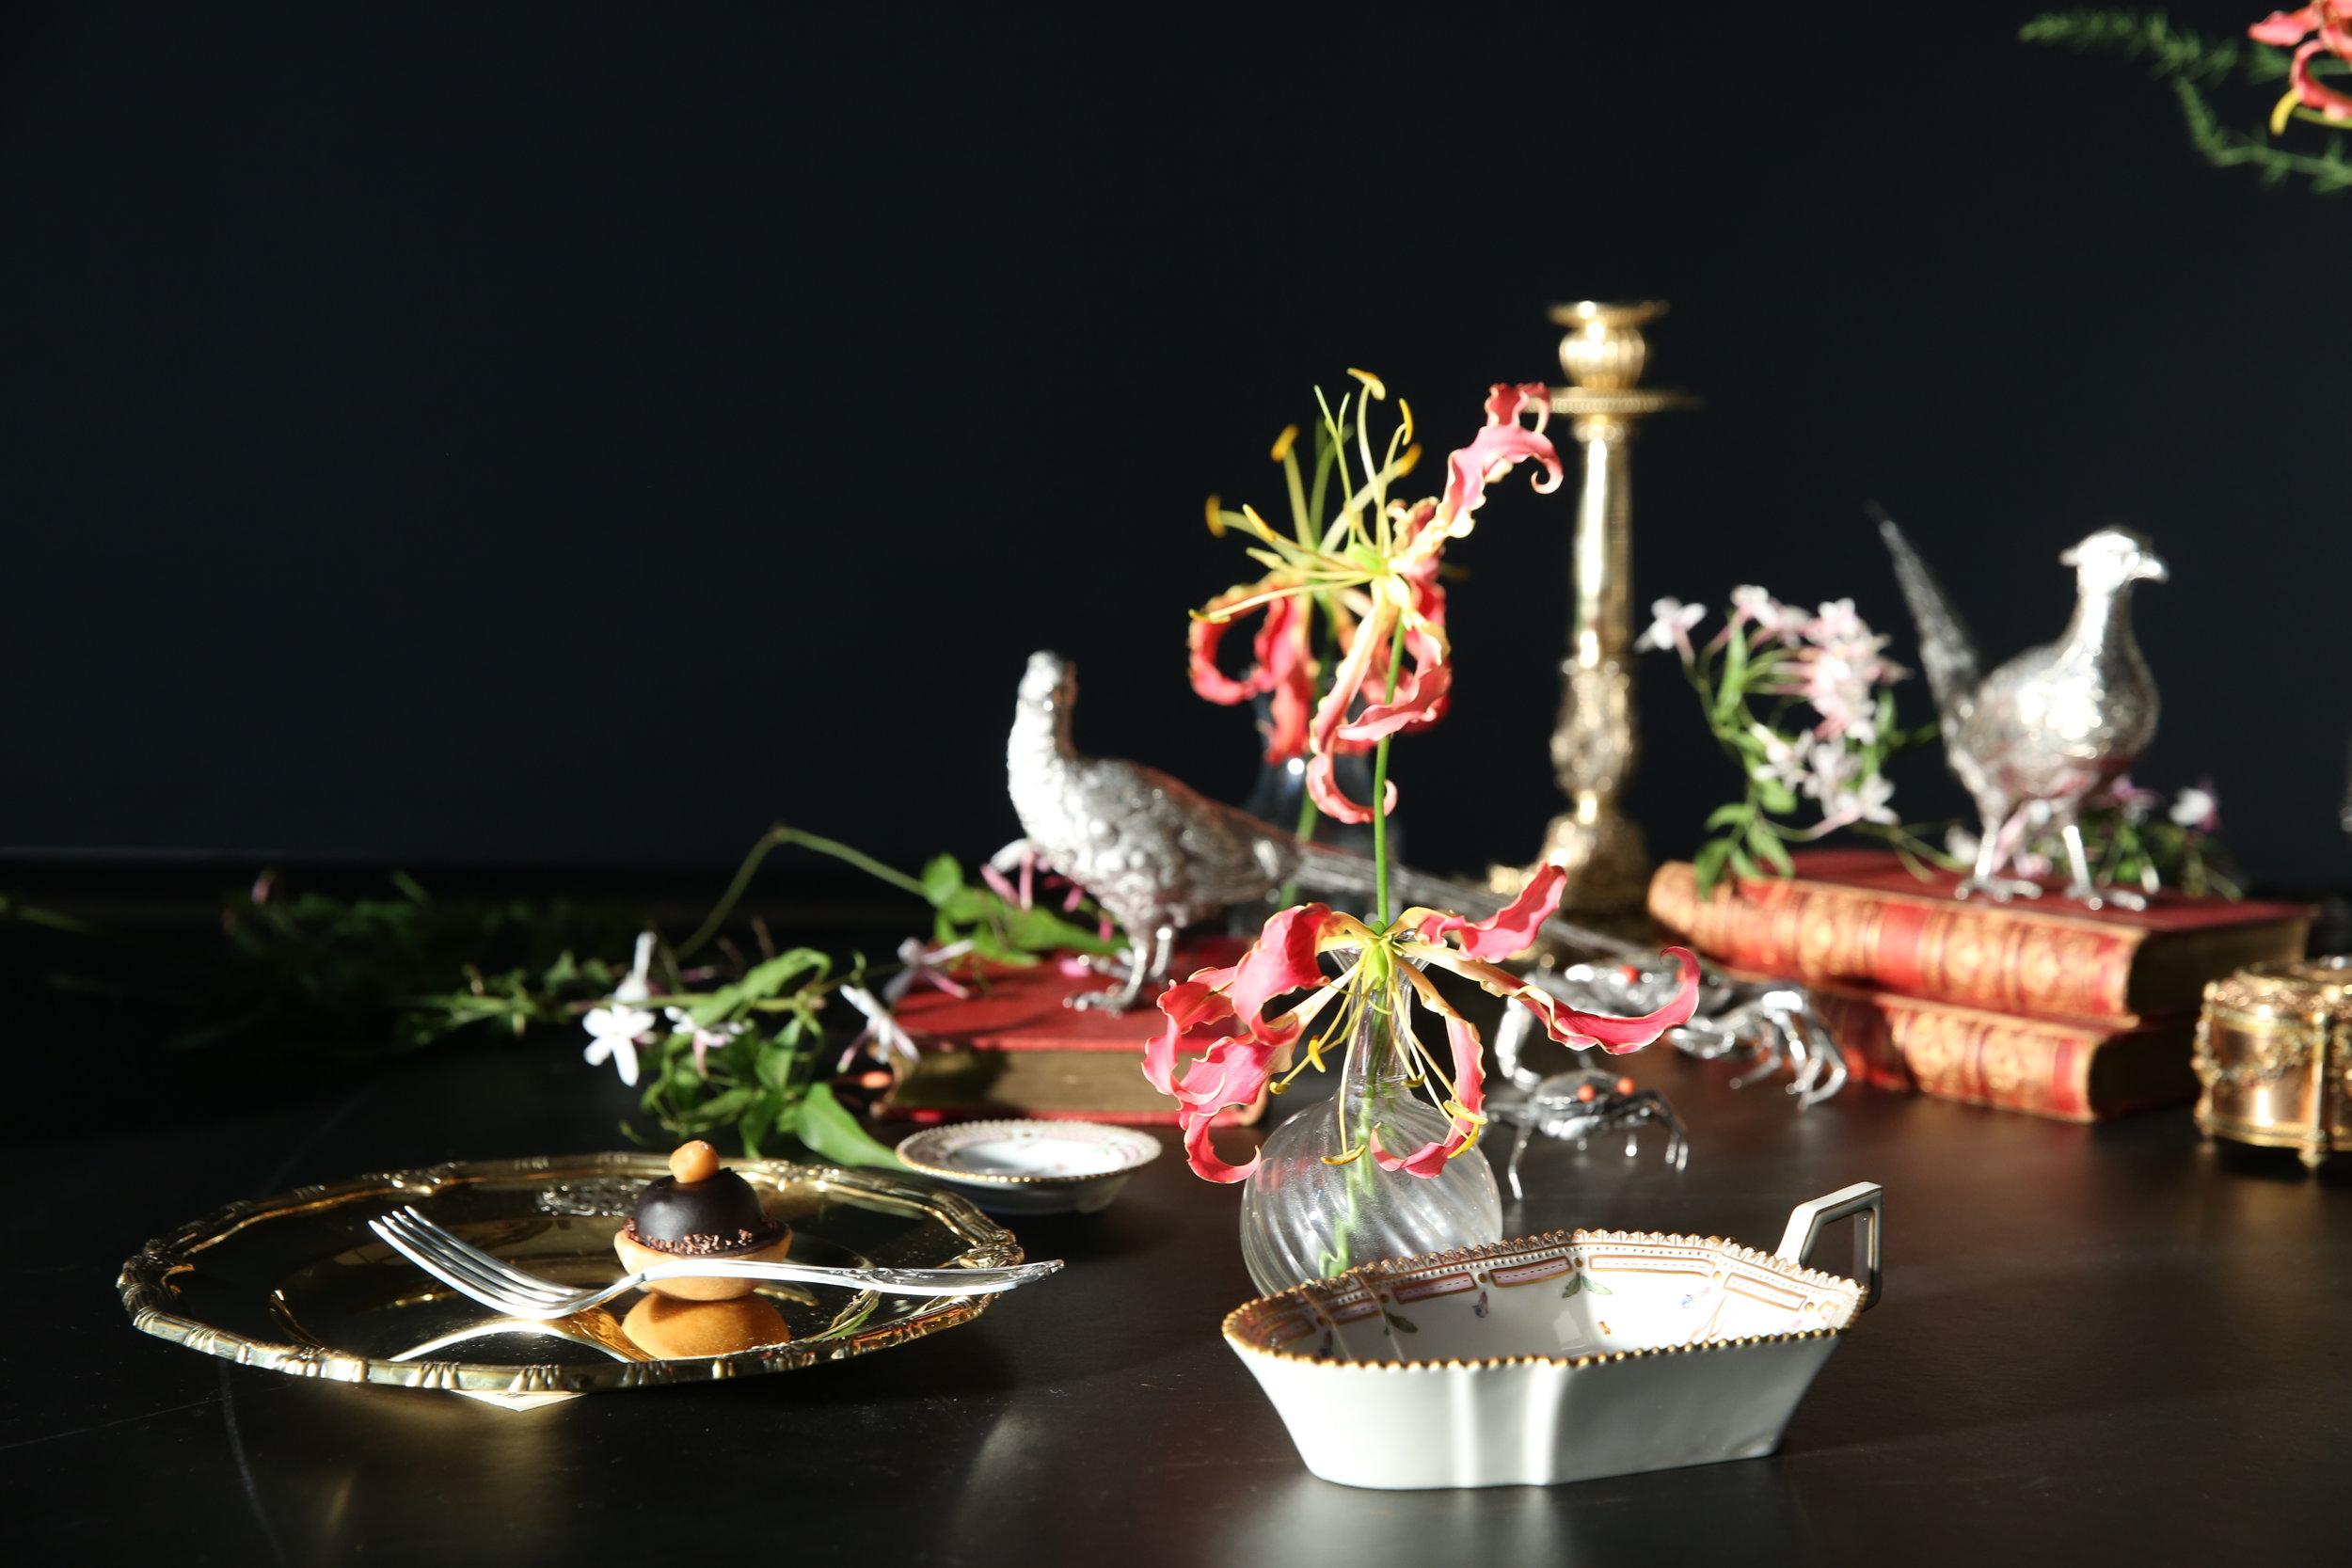 Judy Kim, Floral Designer, Sotheby's Decorative Arts Catalog